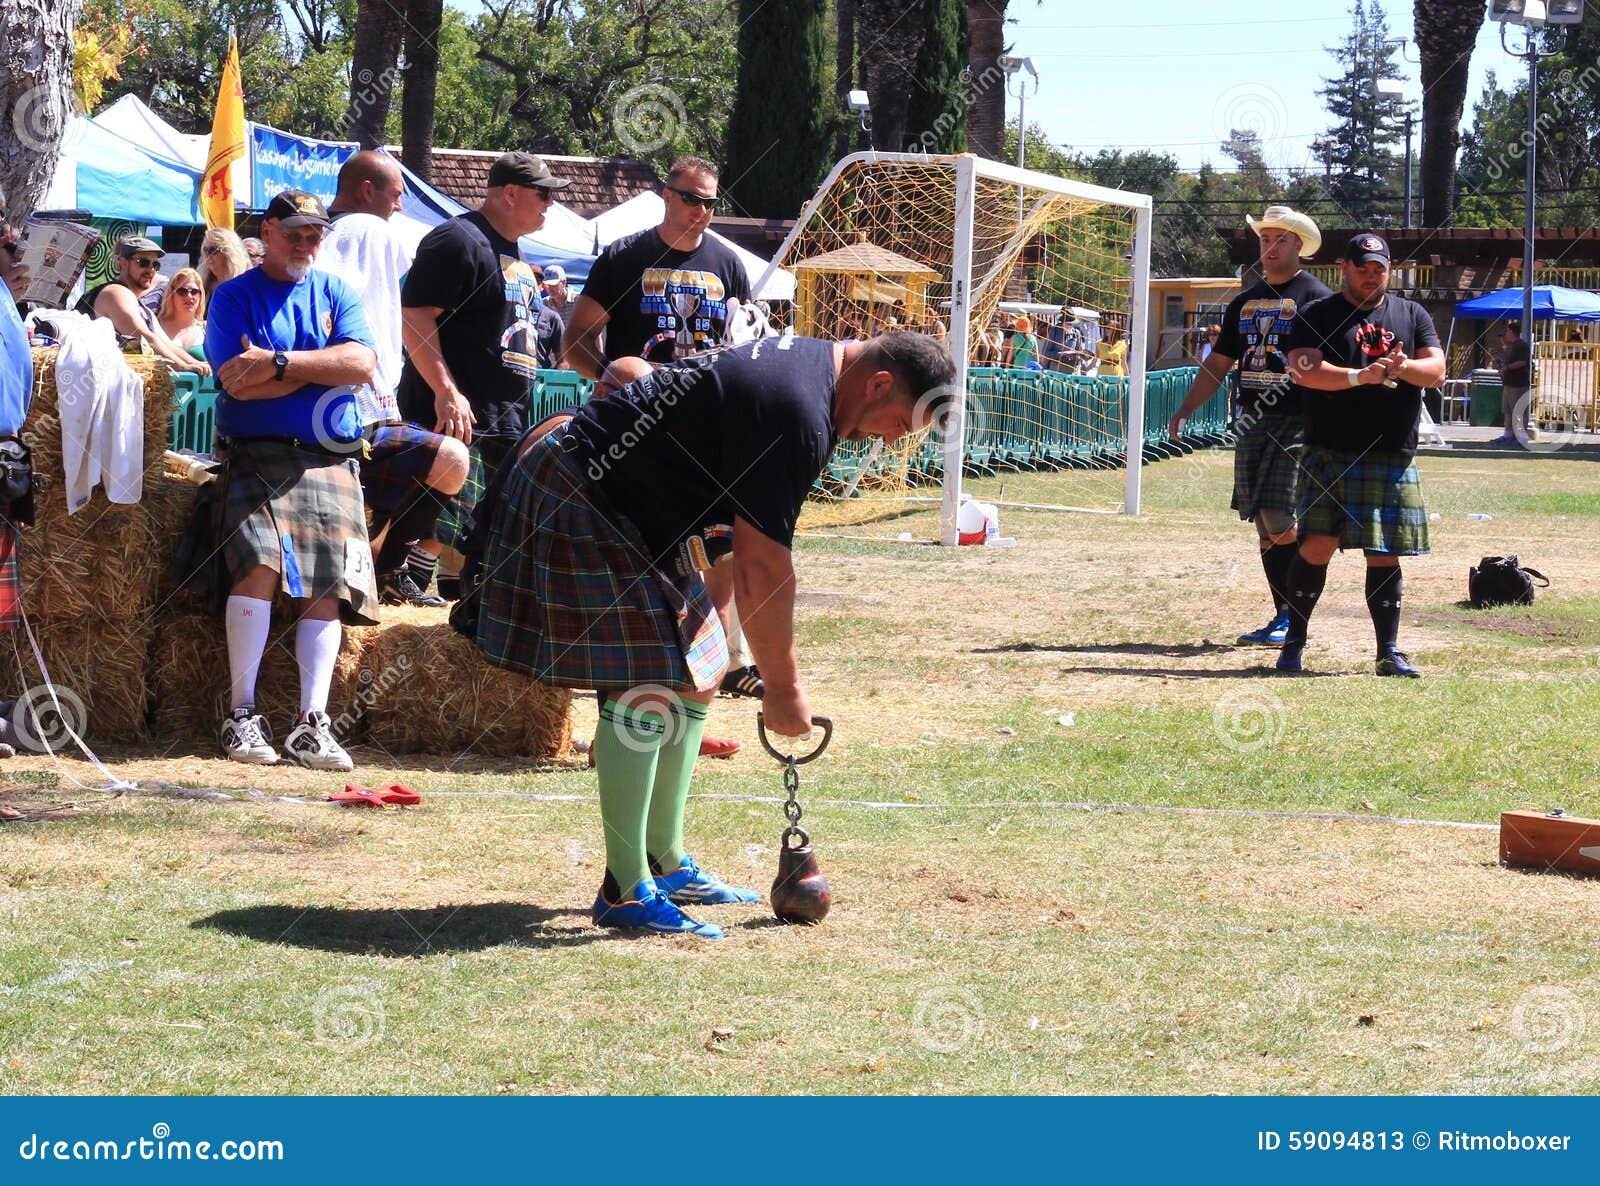 Sebastian Wenta preparing to throw the weight